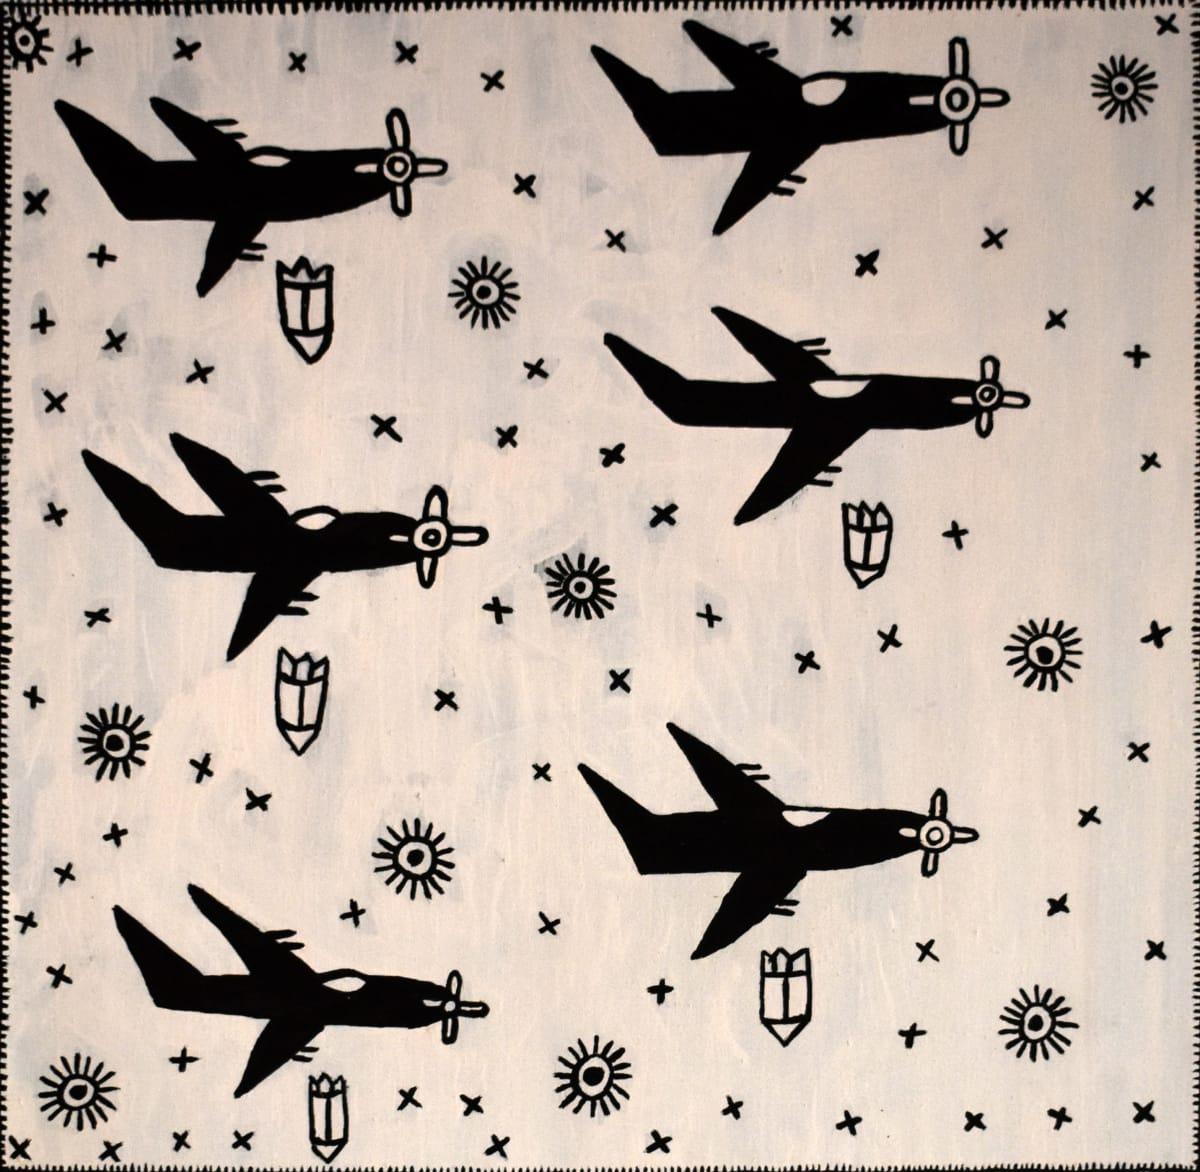 Pauletta Kerinaiua The Bombing of Darwin (Black and White) natural ochres on linen 70 x 70 cm